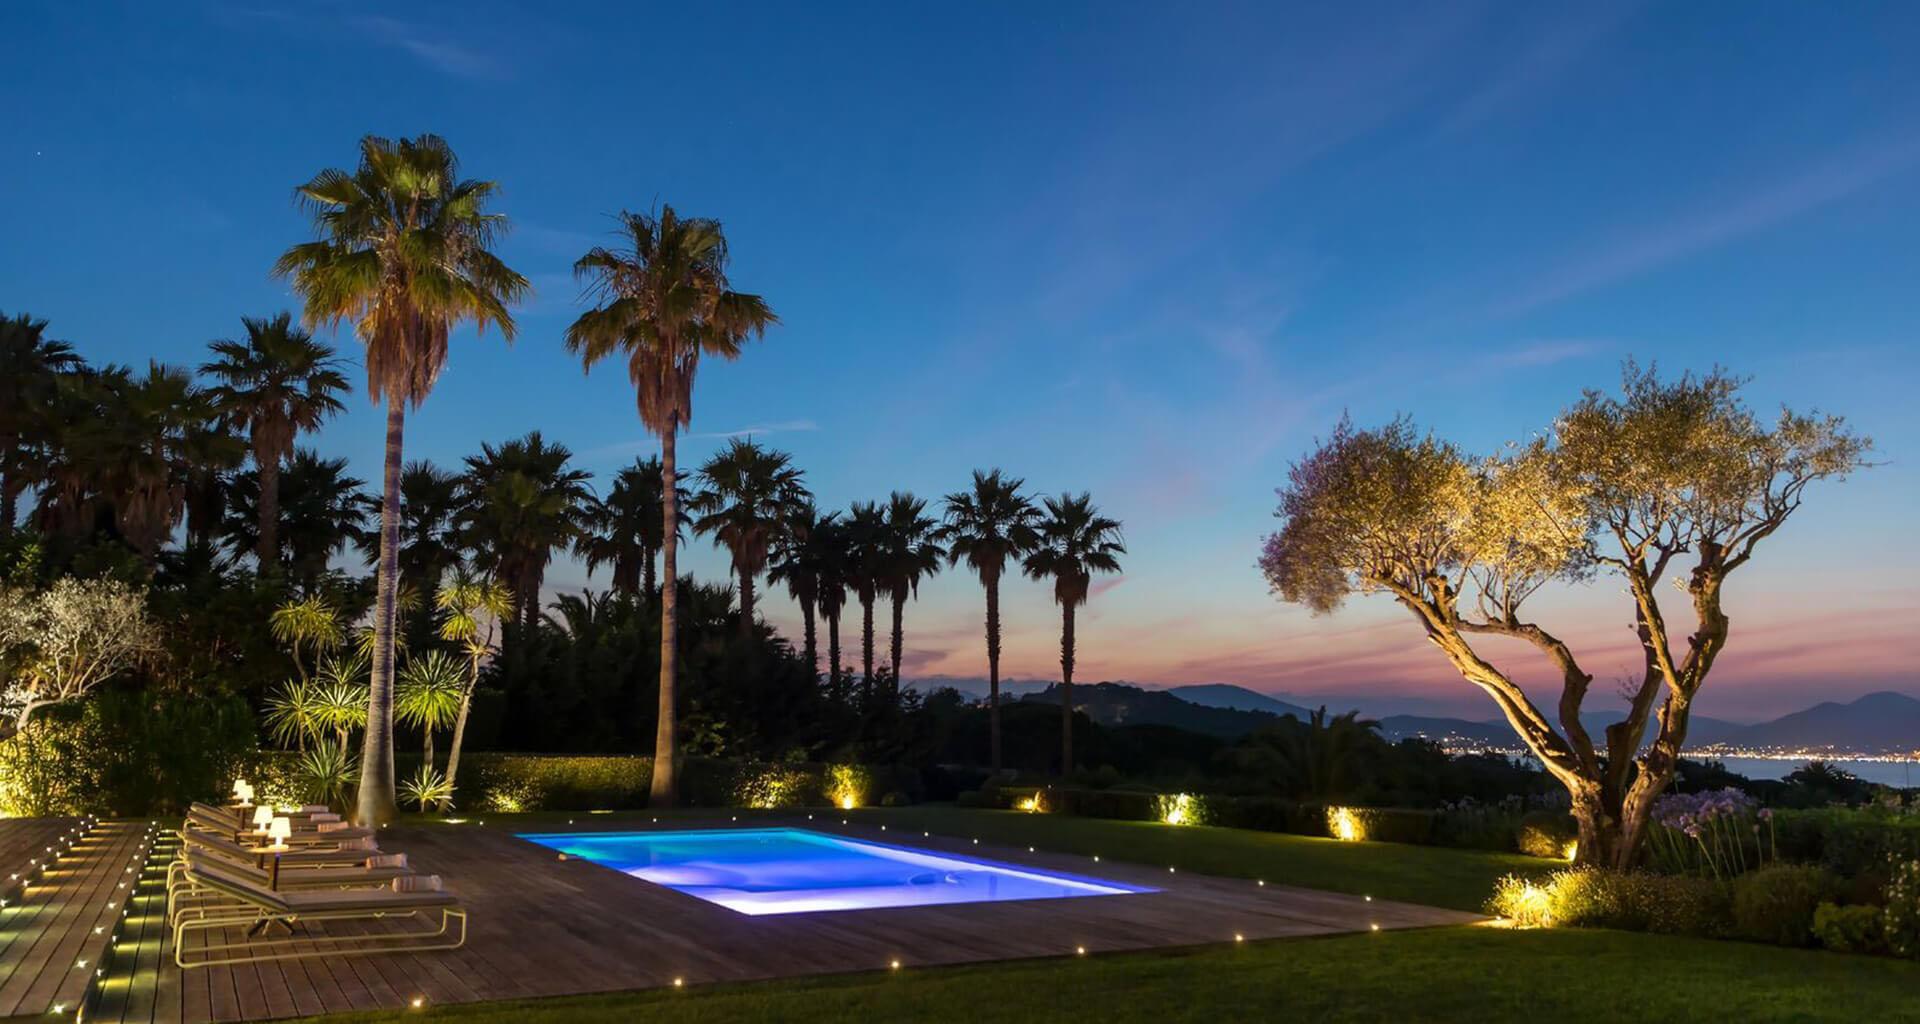 St Tropez & Surrounding Area Villa Gallery